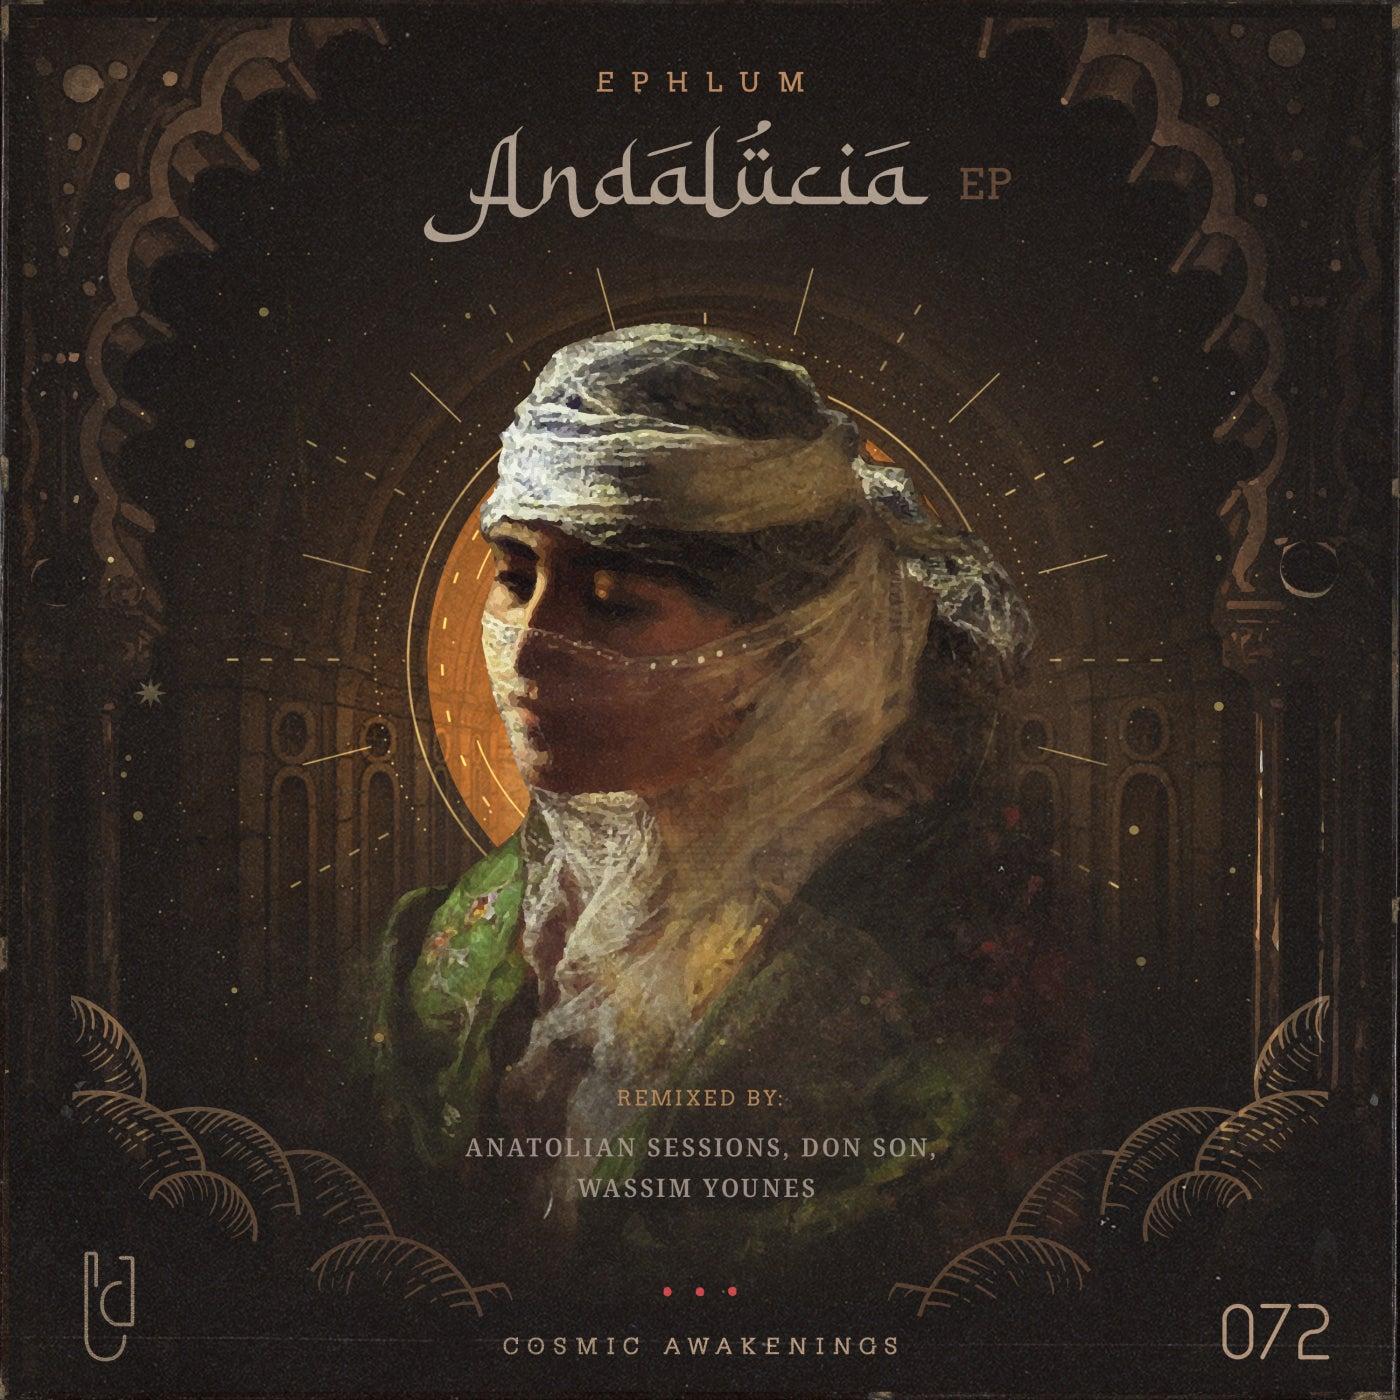 Leila (Anatolian Sessions Remix)